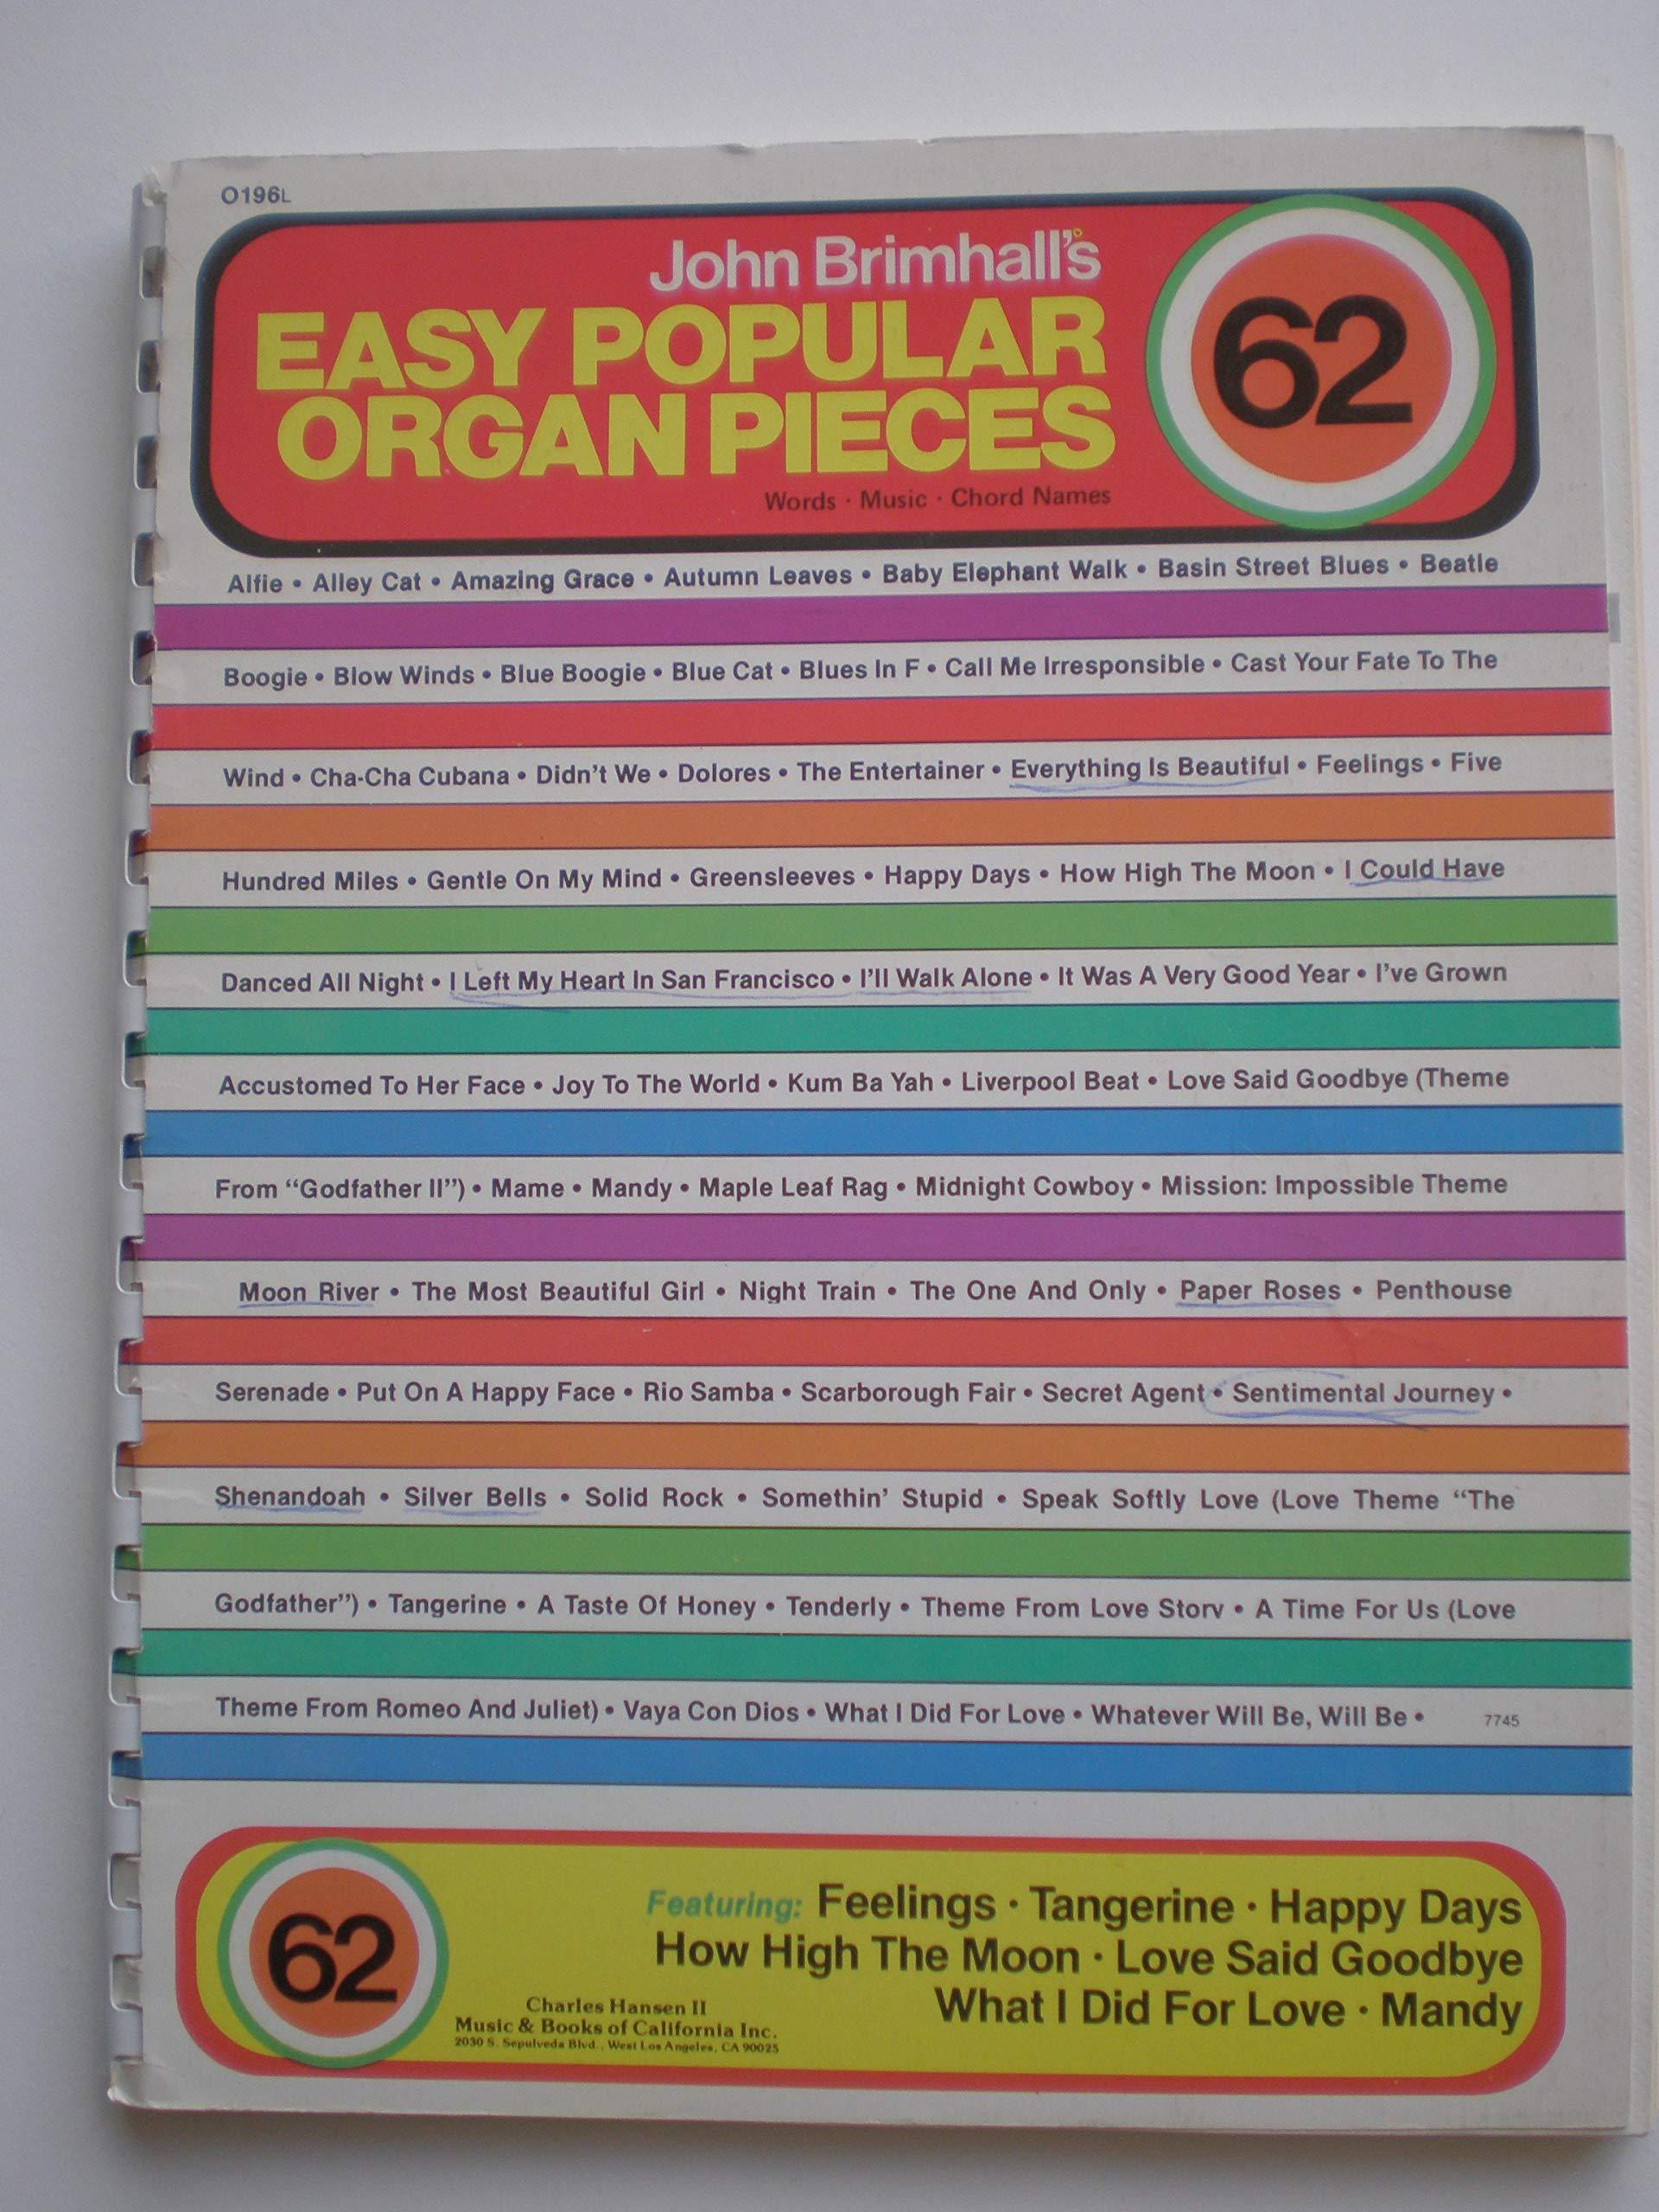 O196L EASY POPULAR 62 ORGAN PIECES Words* Music* Chord Names